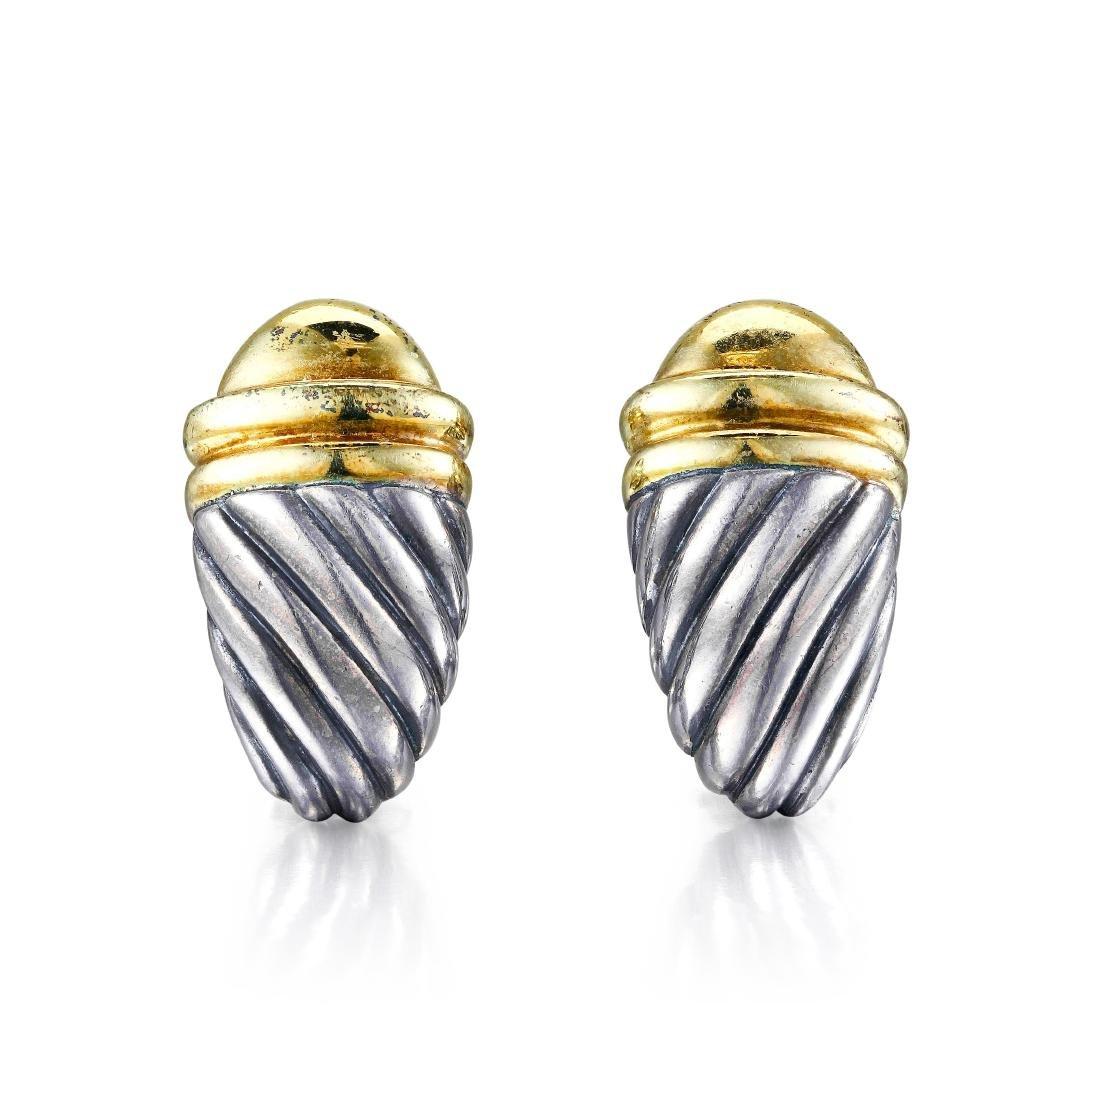 David Yurman Gold and Silver Earrings